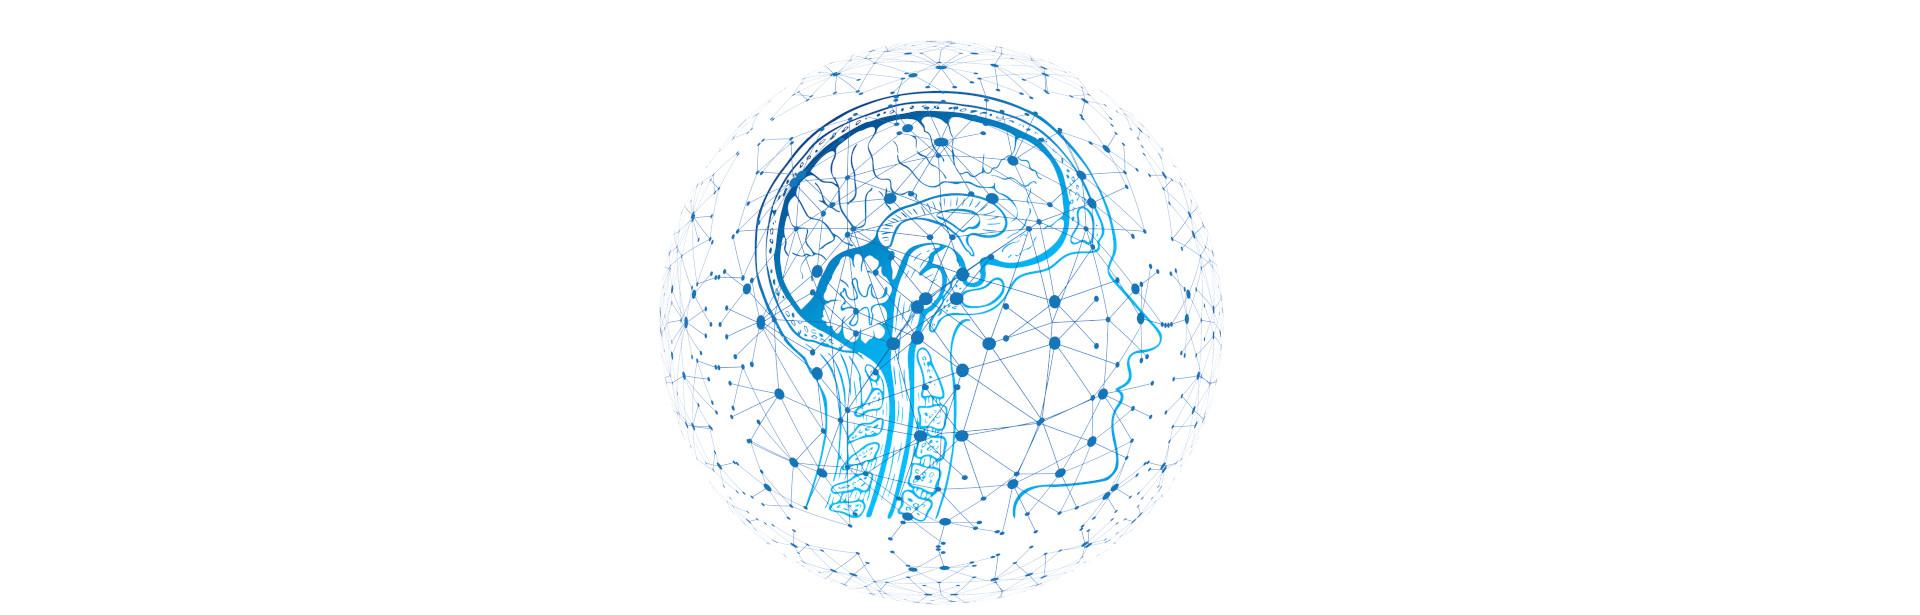 neuroATLANTIC - An Atlantic innovation platform on diagnosis and treatment of neurological diseases and aging